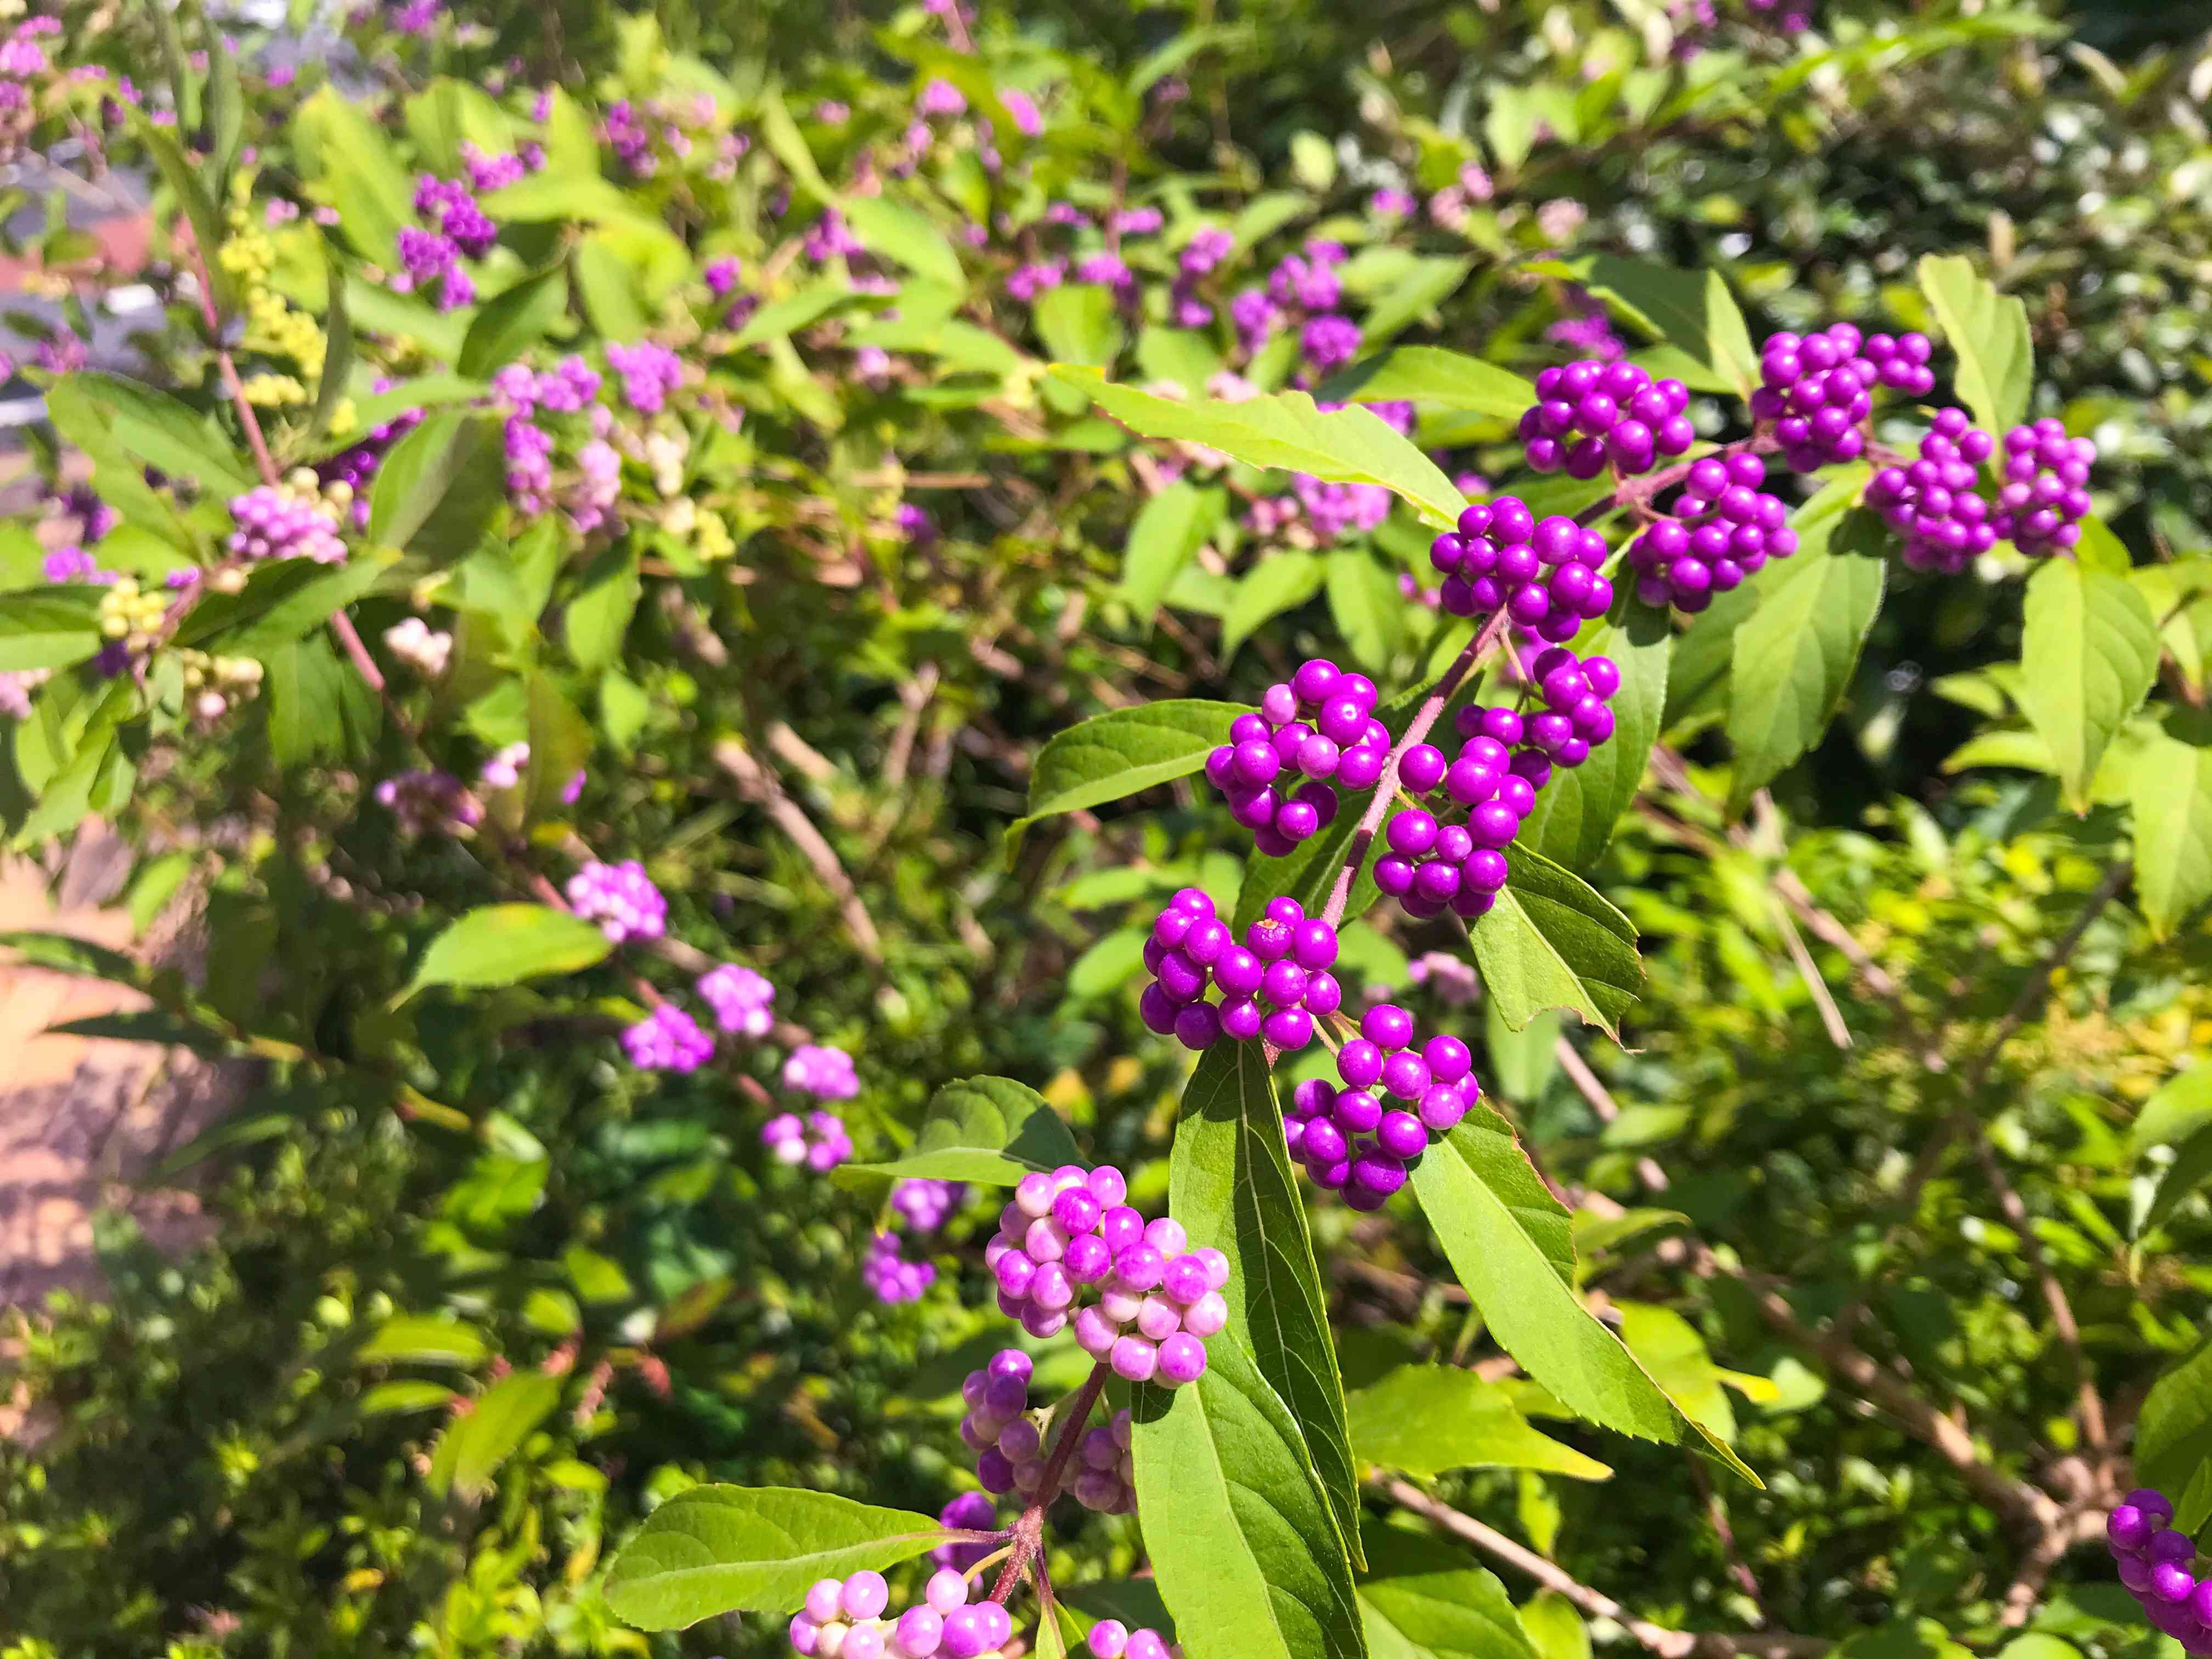 Beautyberry, Callicarpa